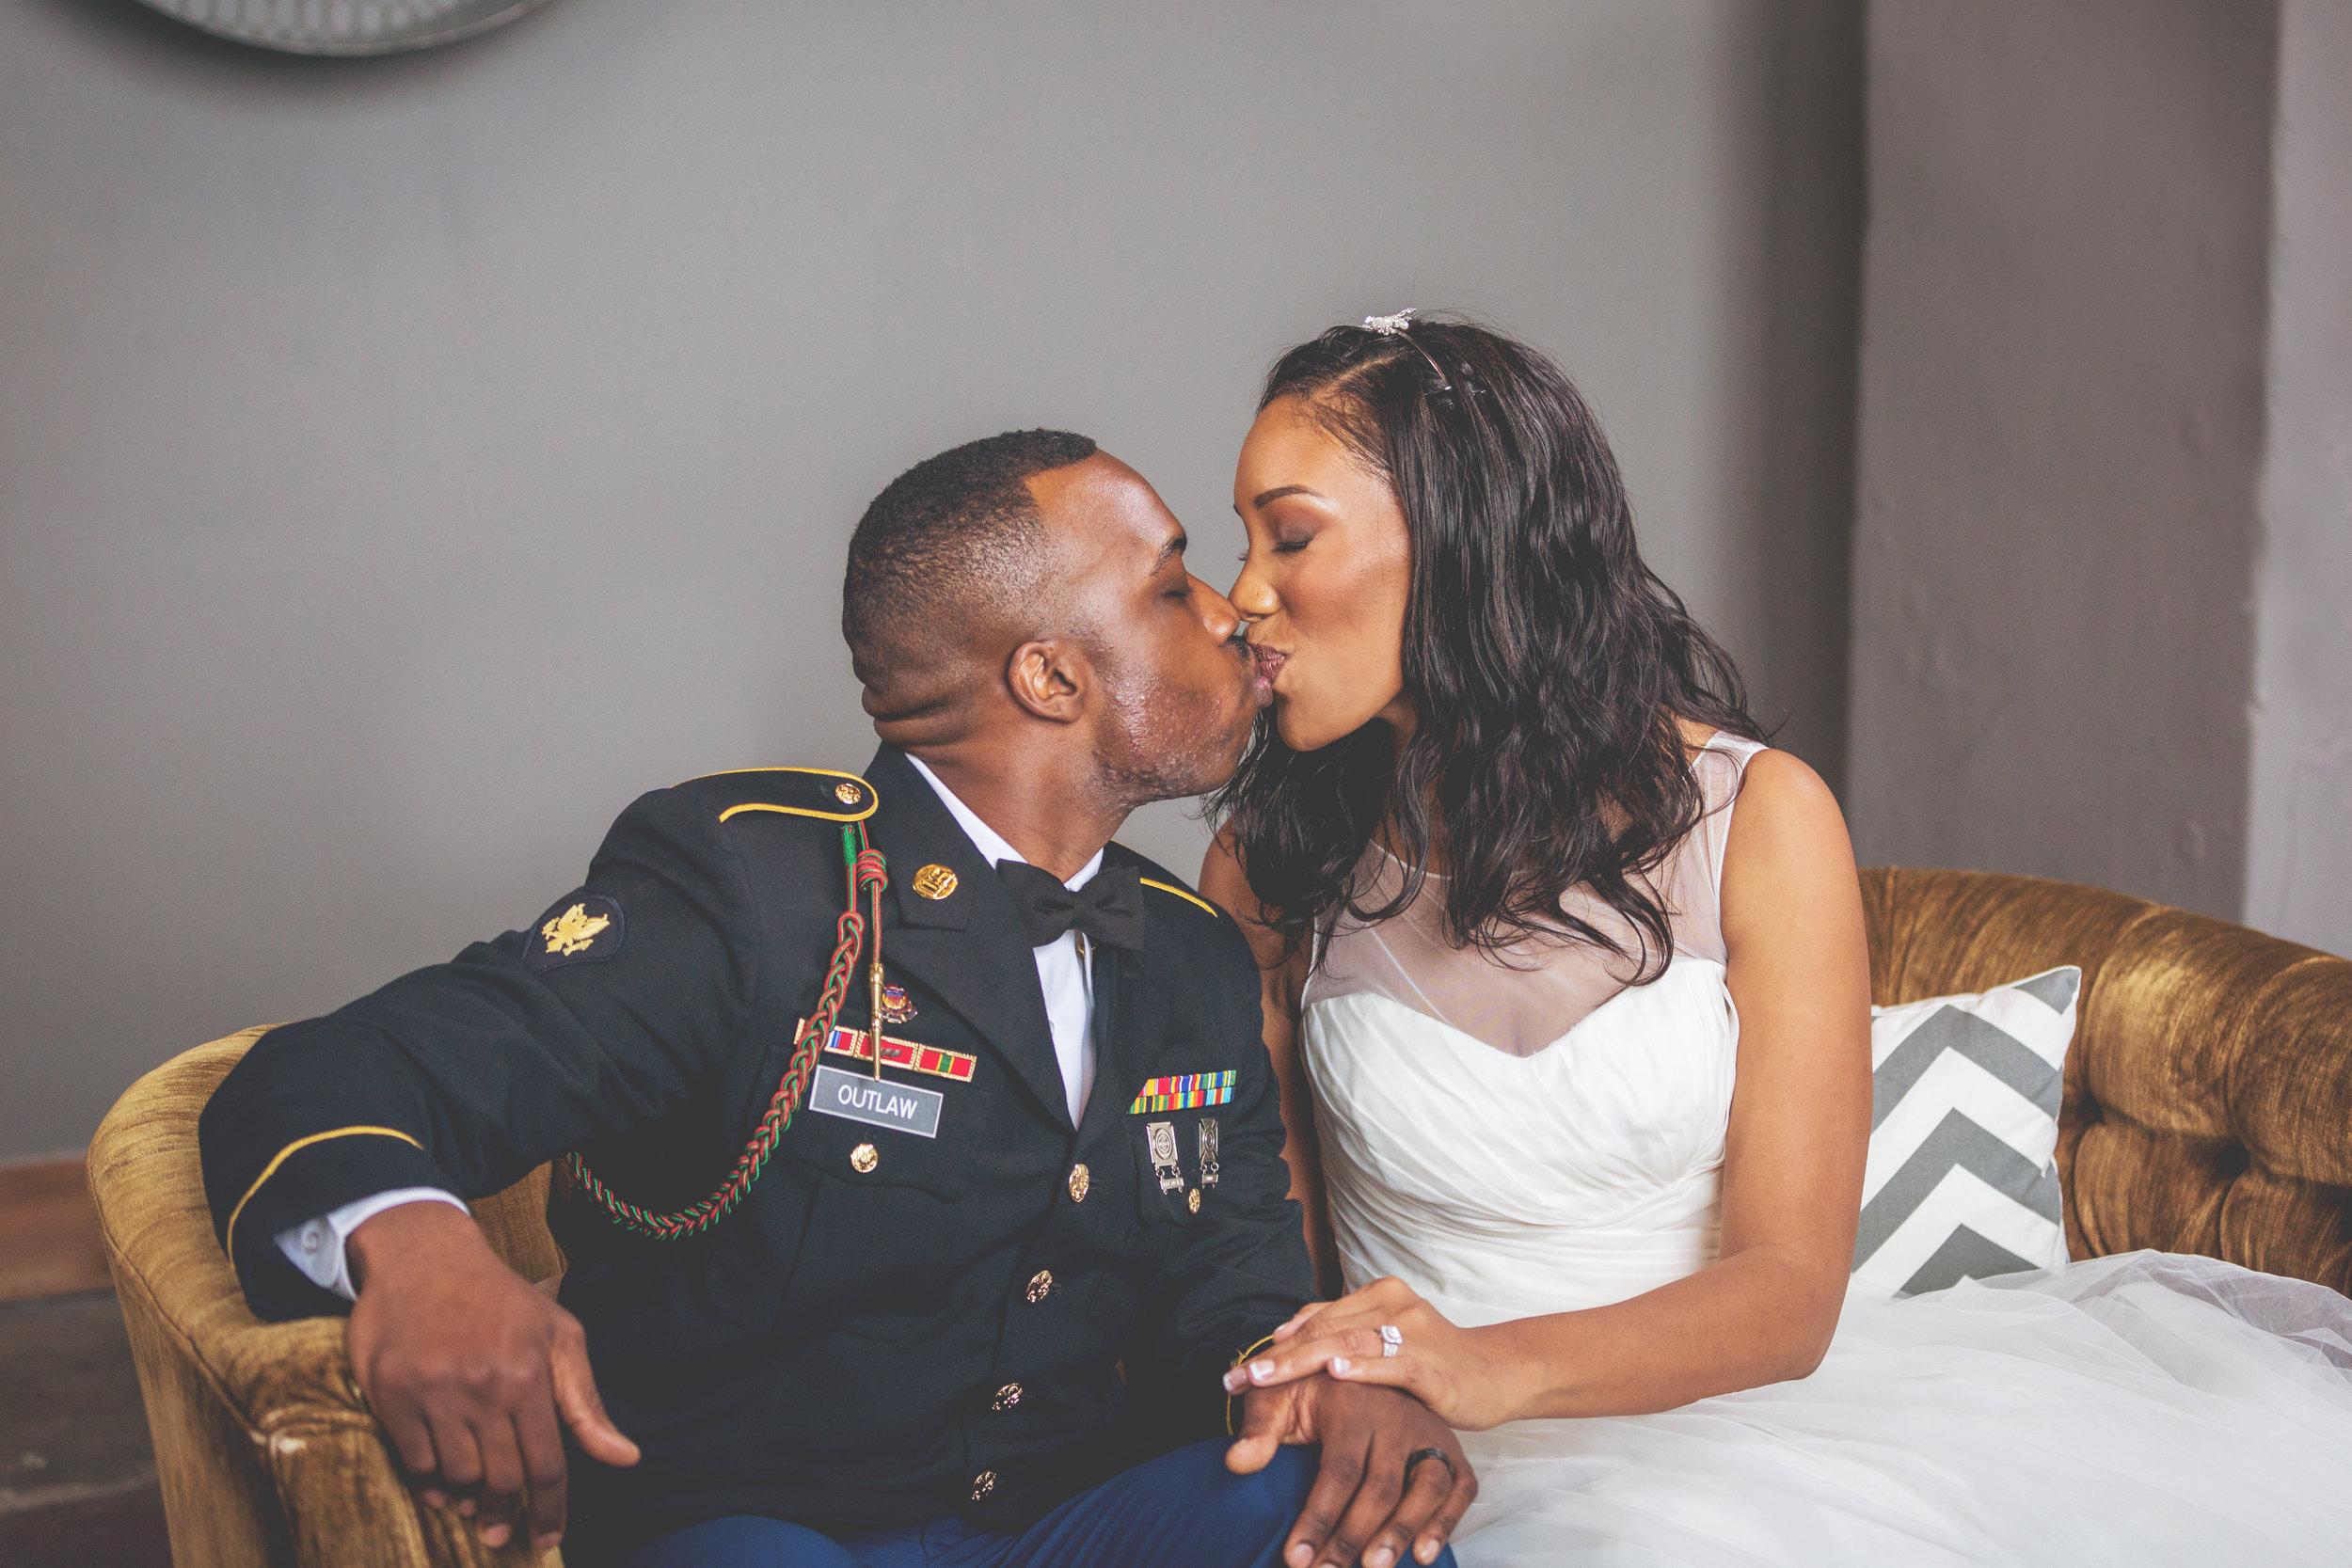 Kansas+City-Small+Wedding_Venue_Elope_Intimate_Ceremony_Memorial+Day_16.jpg